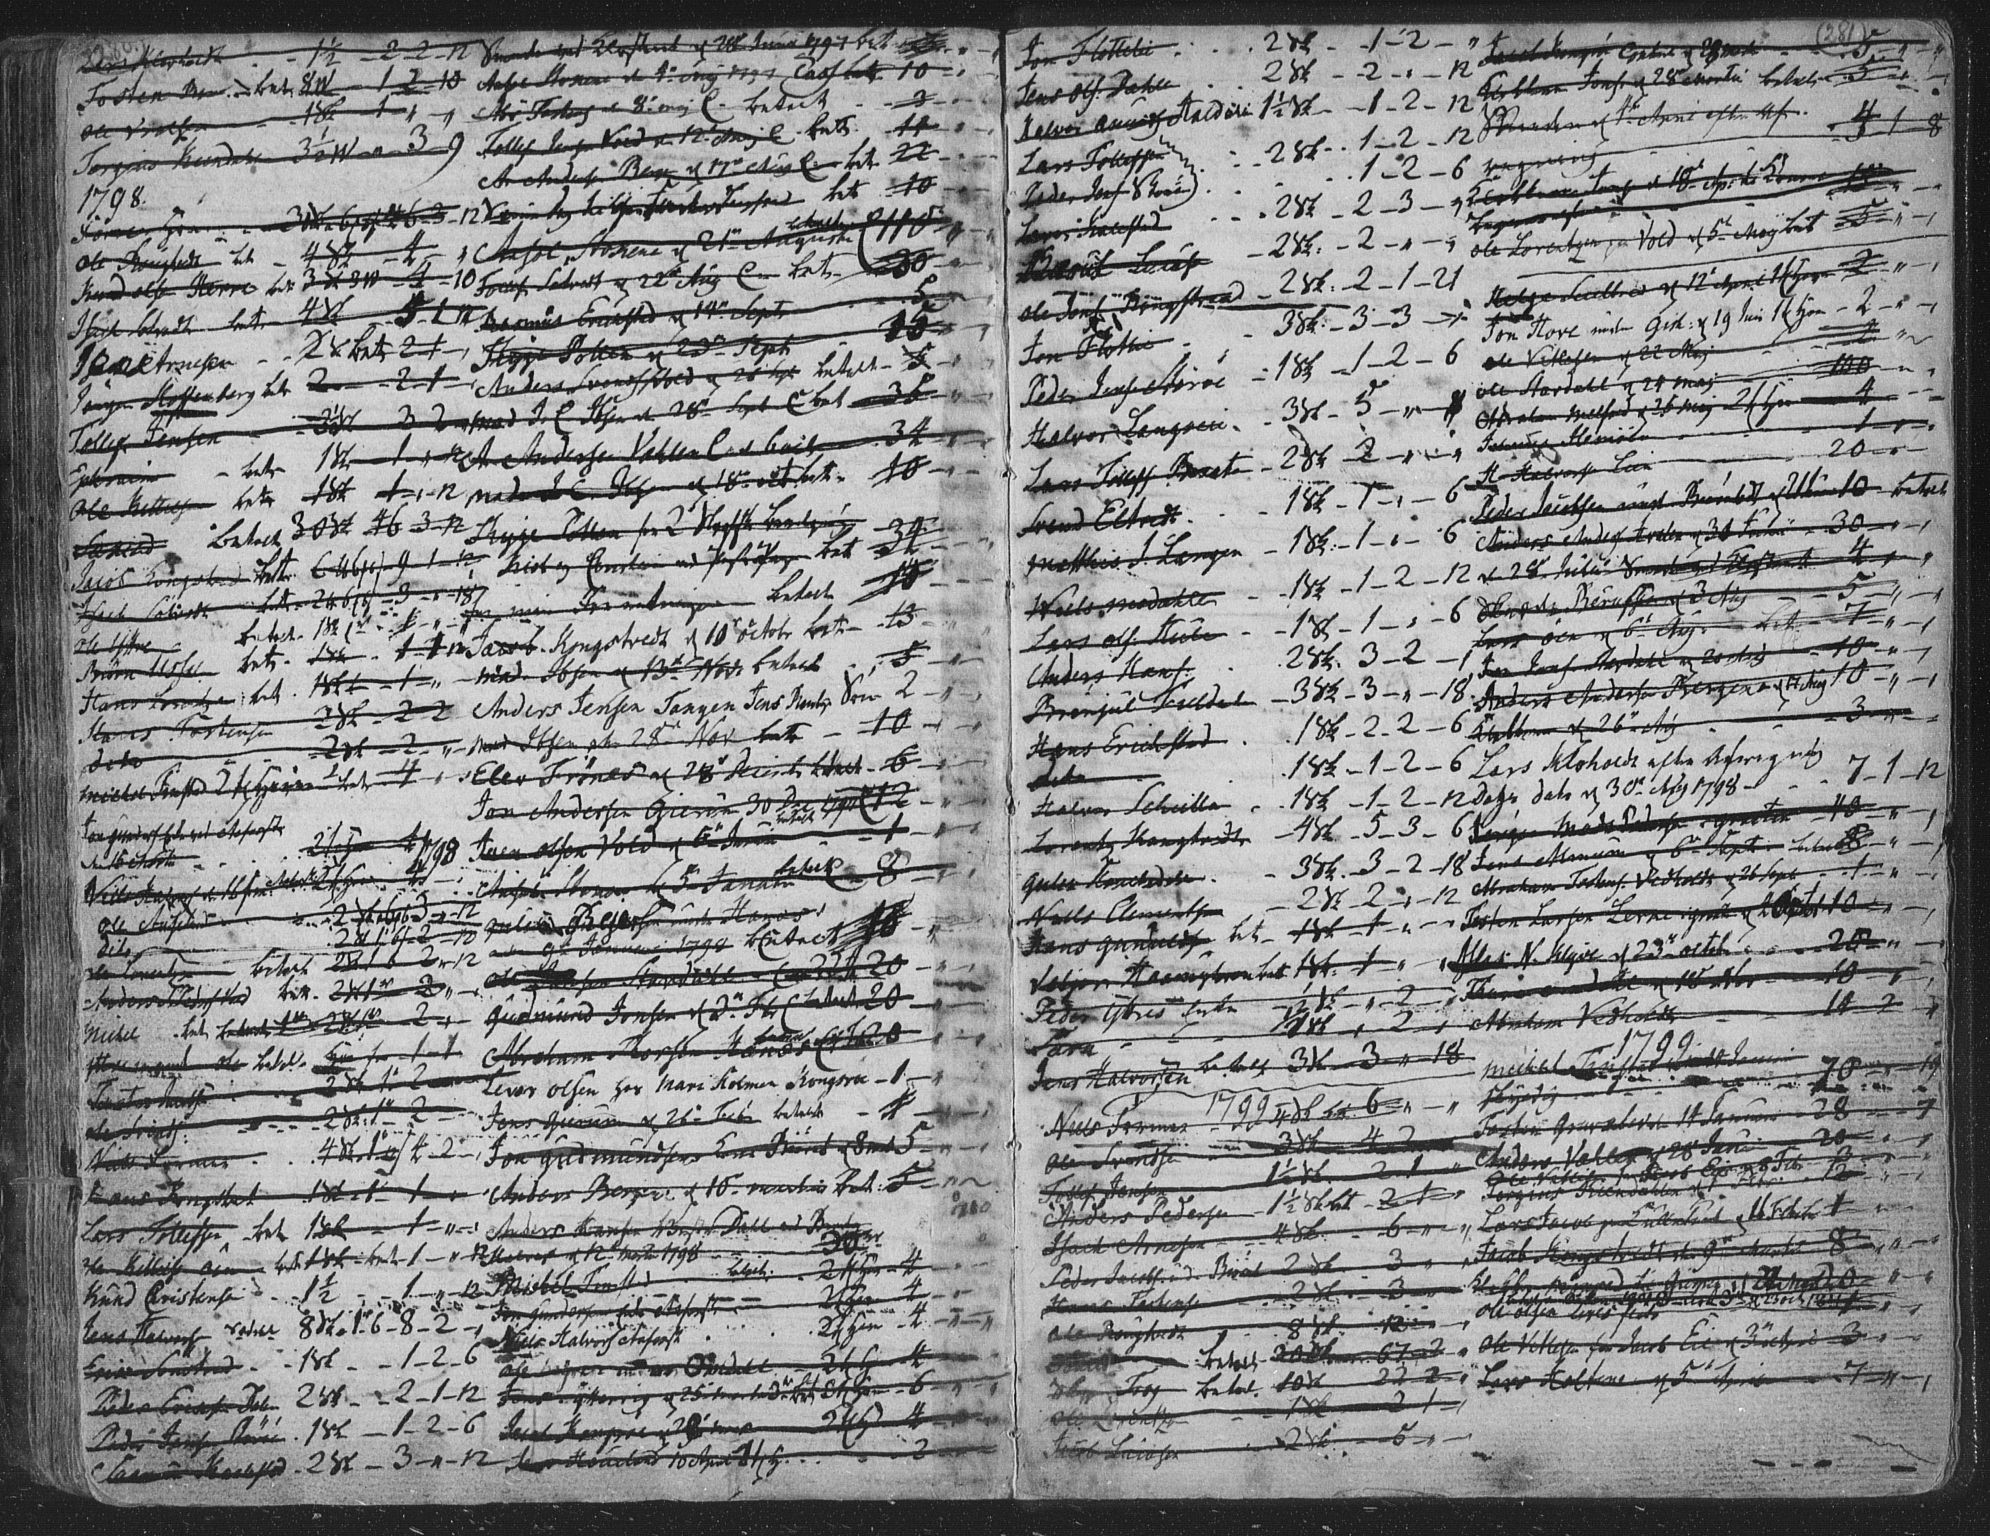 SAKO, Solum kirkebøker, F/Fa/L0003: Ministerialbok nr. I 3, 1761-1814, s. 280-281